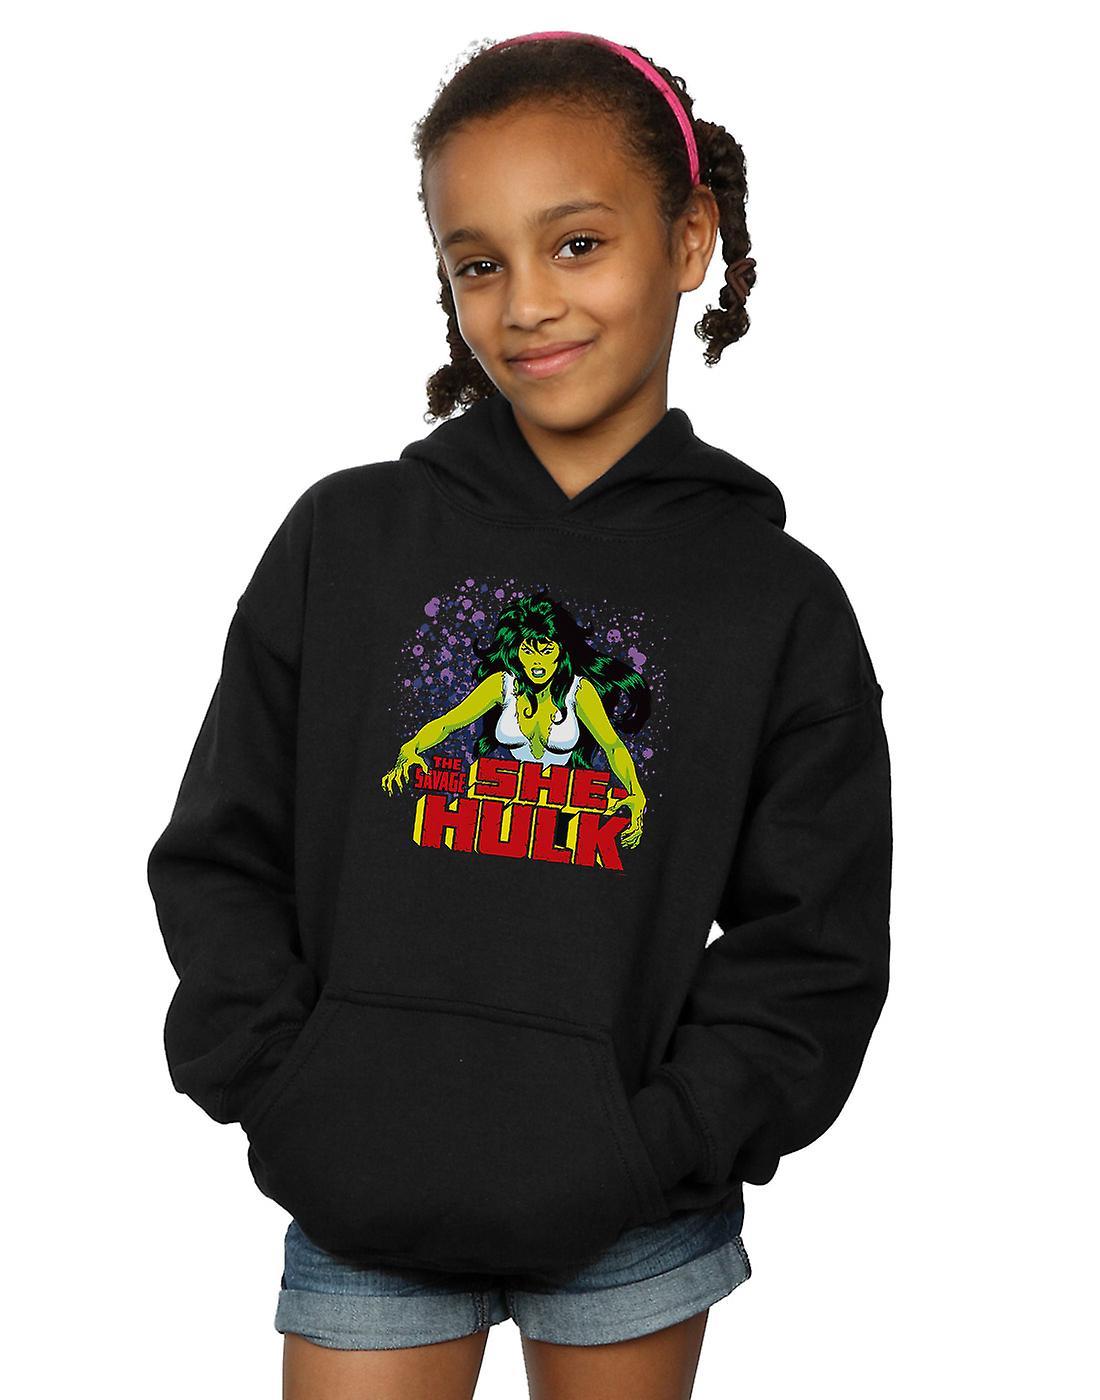 Marvel Girls The Savage She-Hulk Hoodie